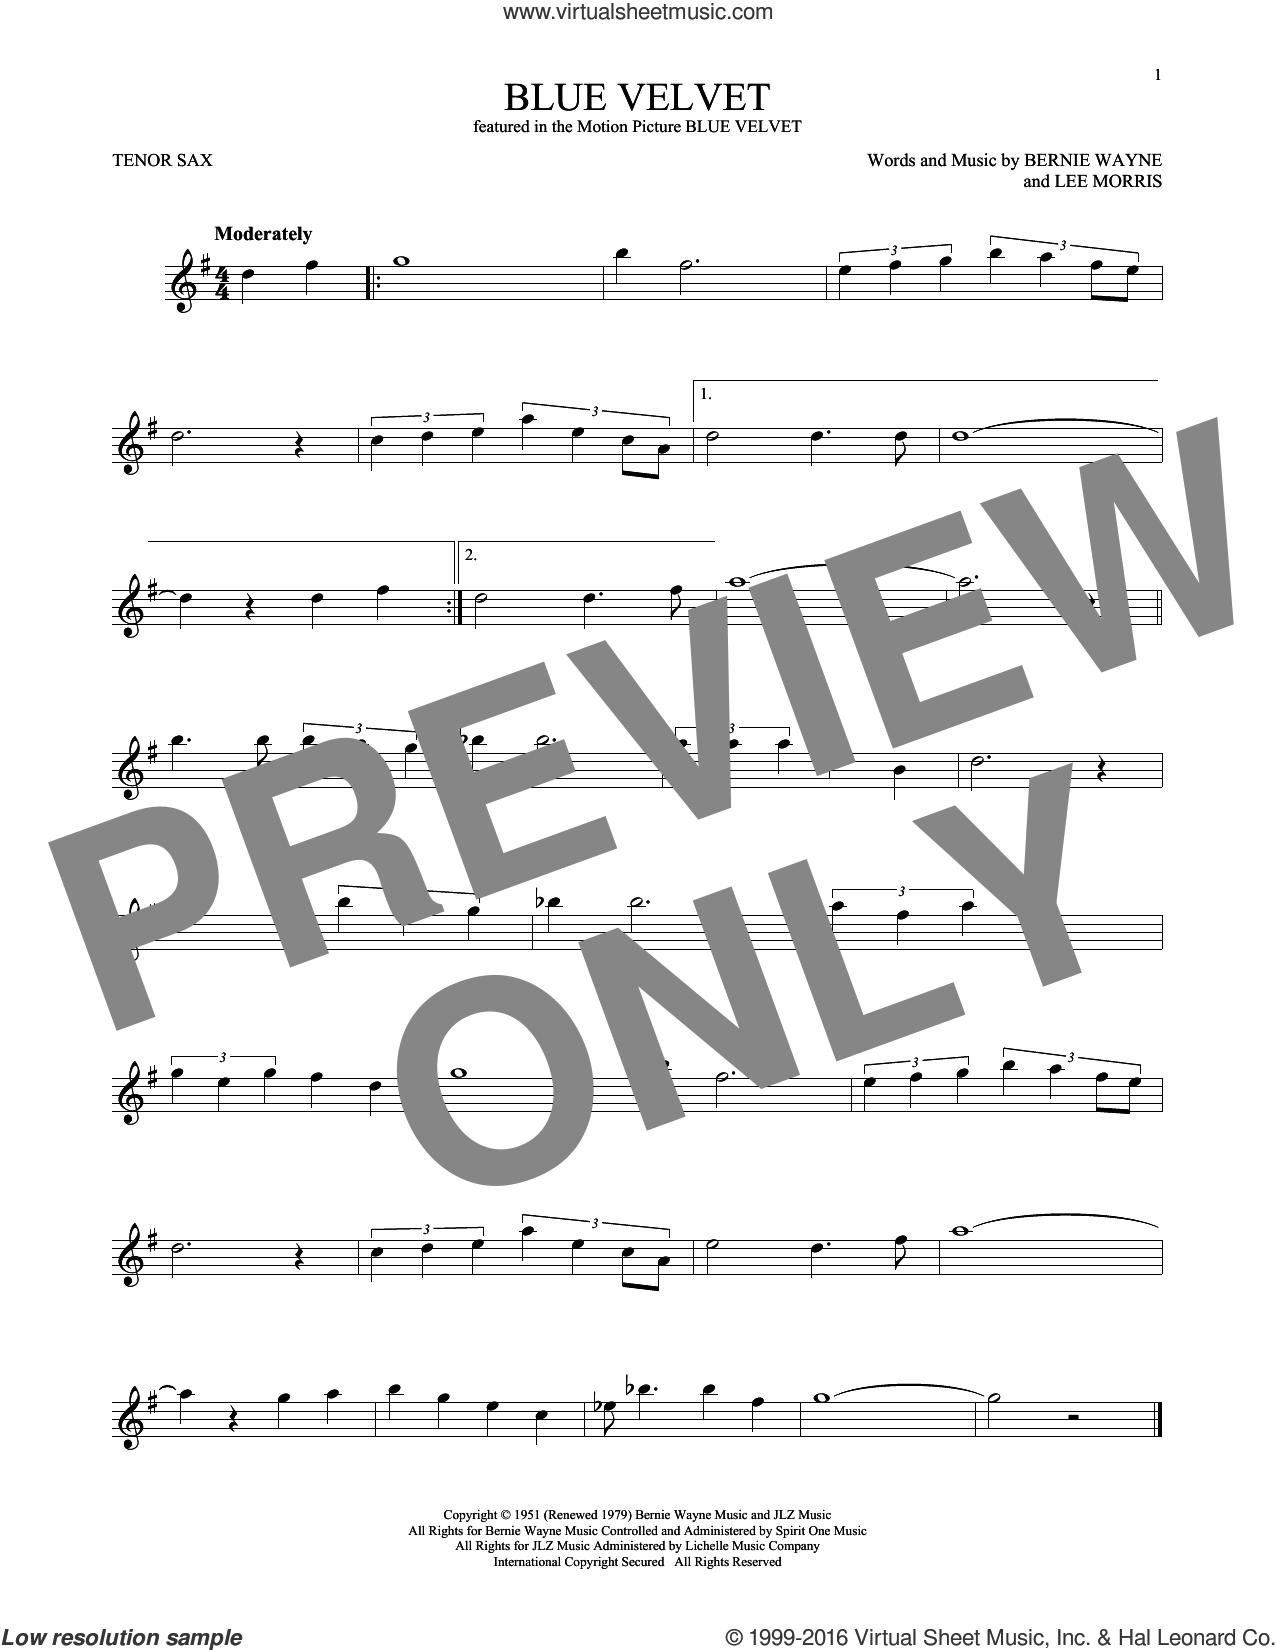 Blue Velvet sheet music for tenor saxophone solo by Bobby Vinton, Statues, Bernie Wayne and Lee Morris, intermediate skill level